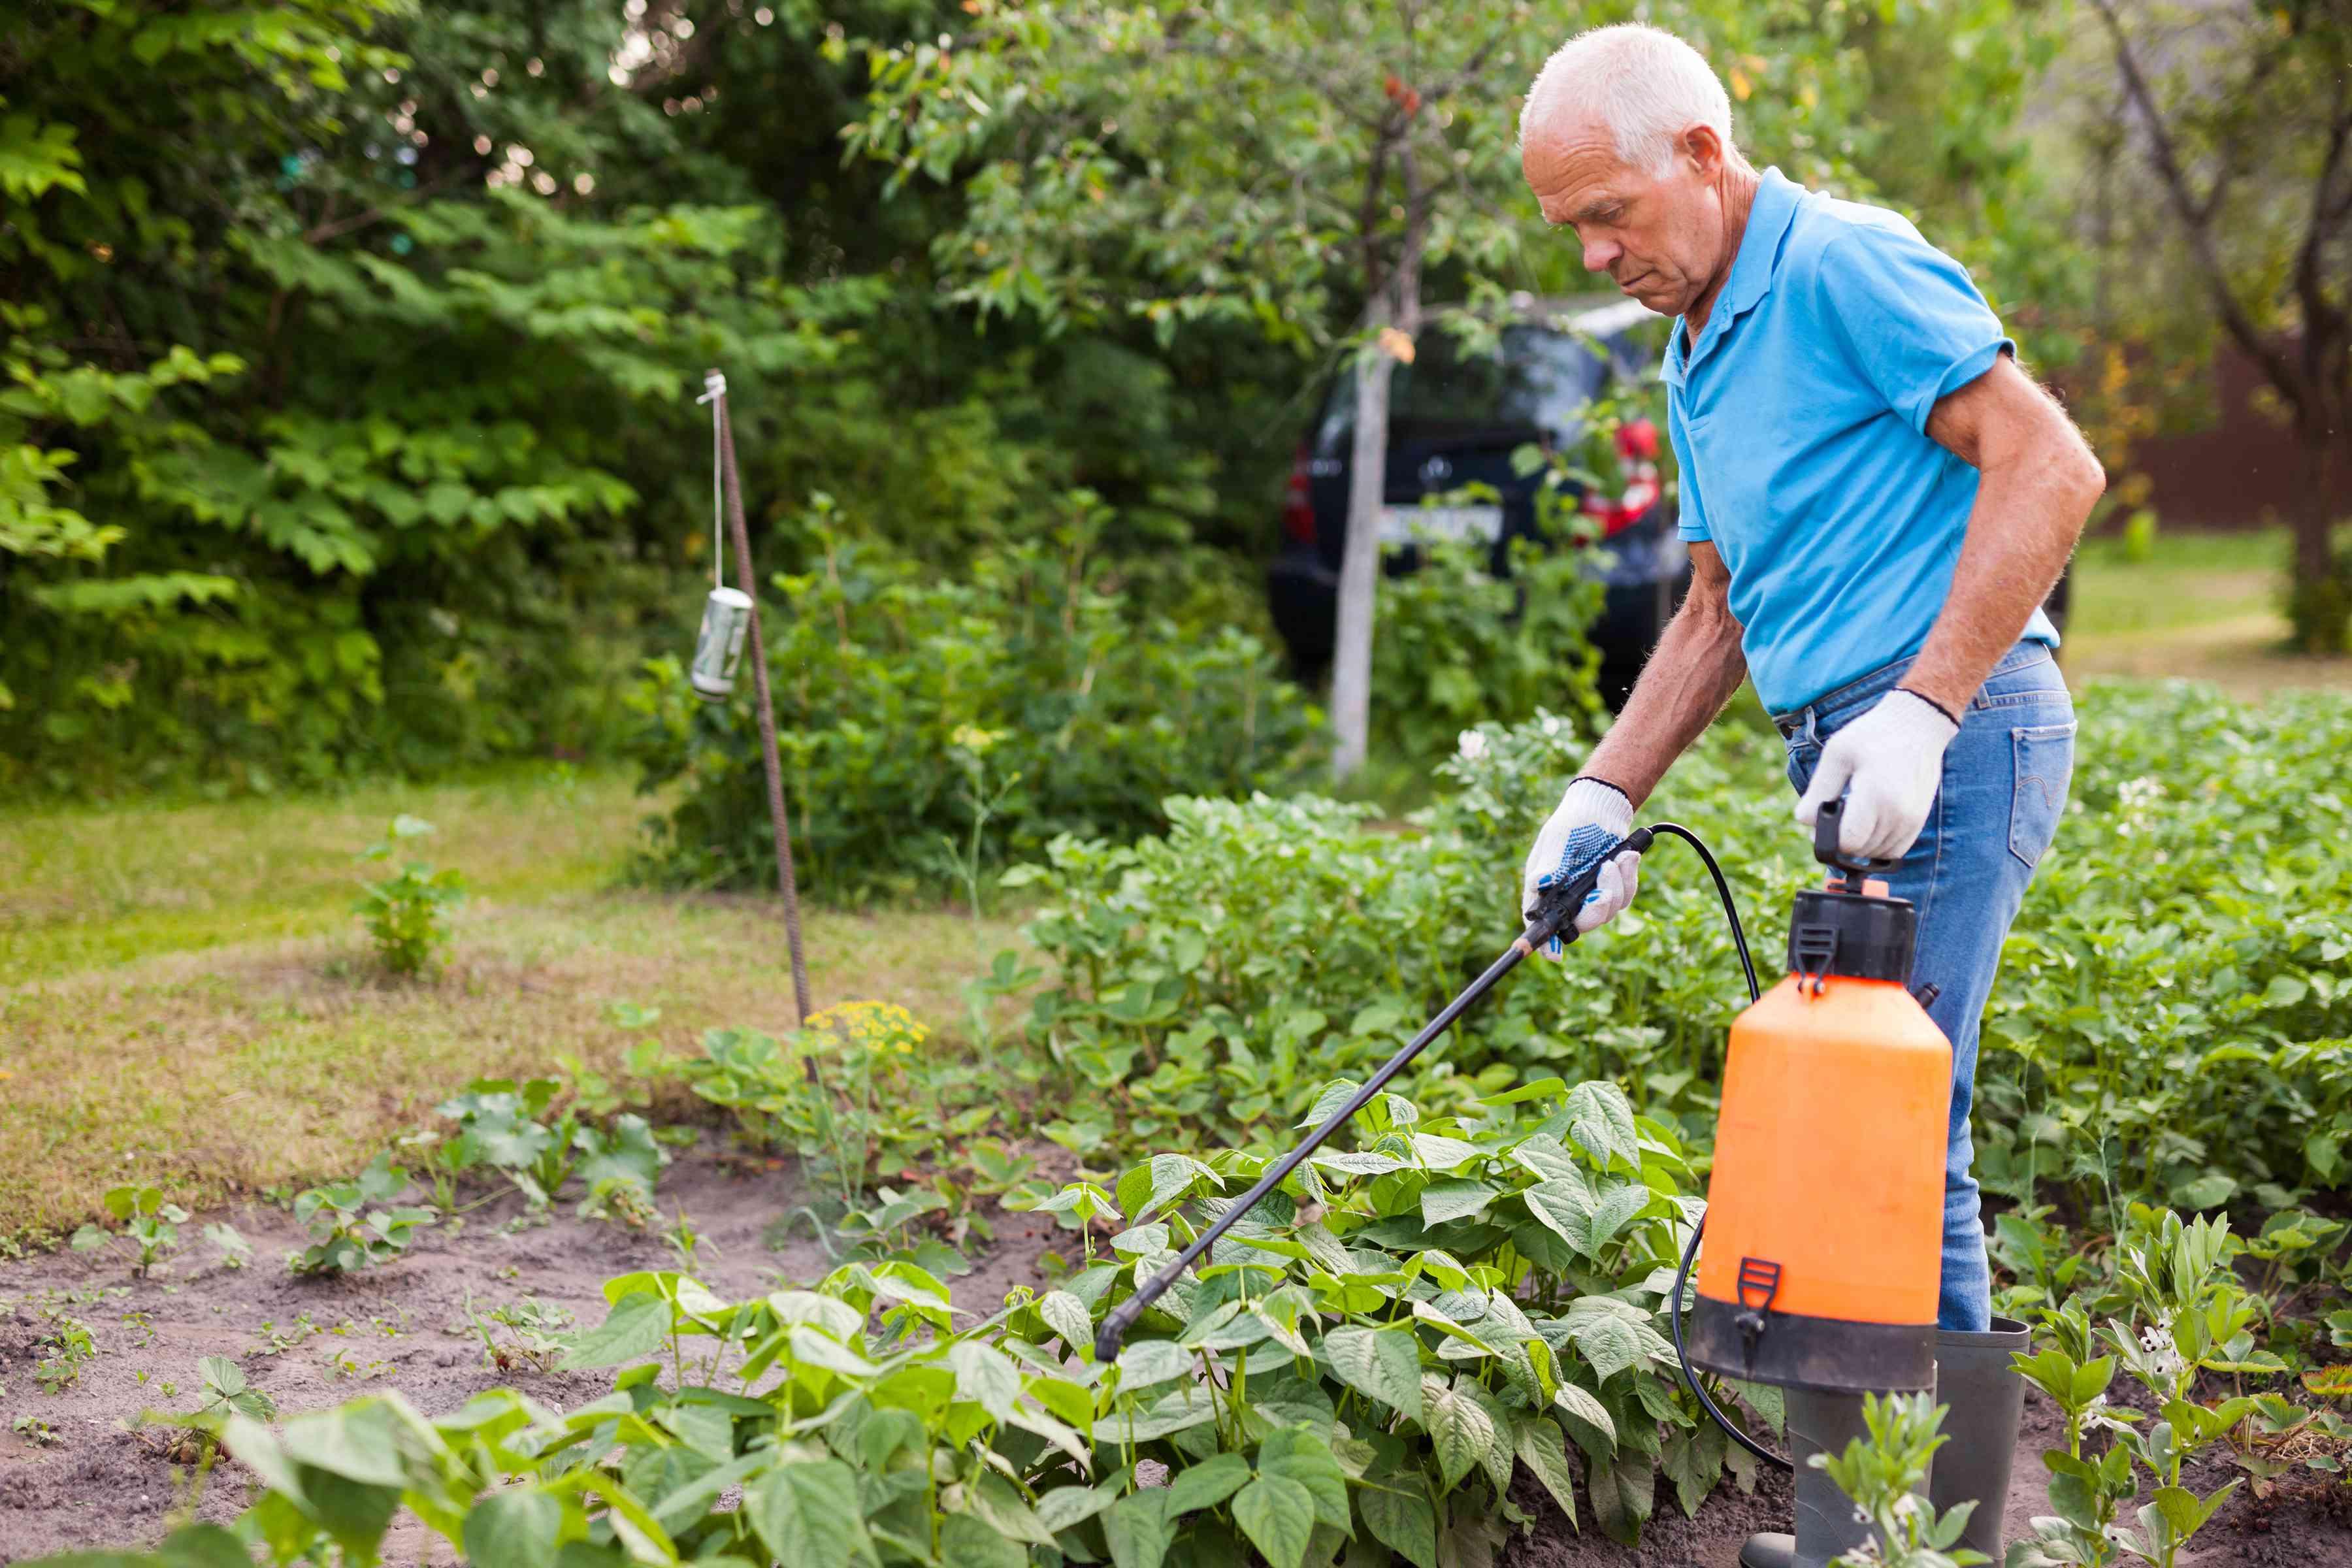 man sprays pesticide in his garden